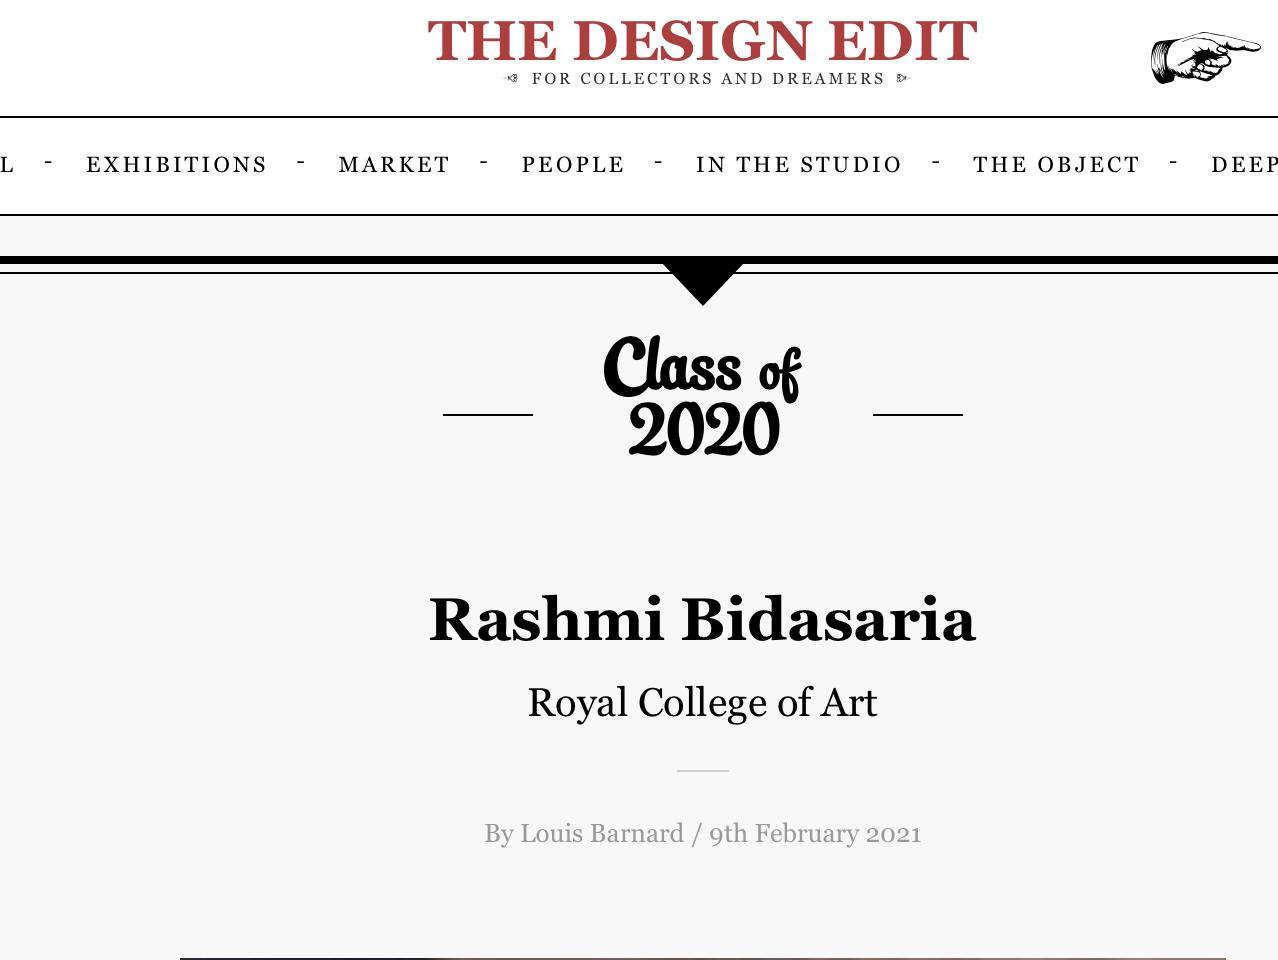 The Design Edit - Rashmi Bidasaria - Royal College of Art class of 2020